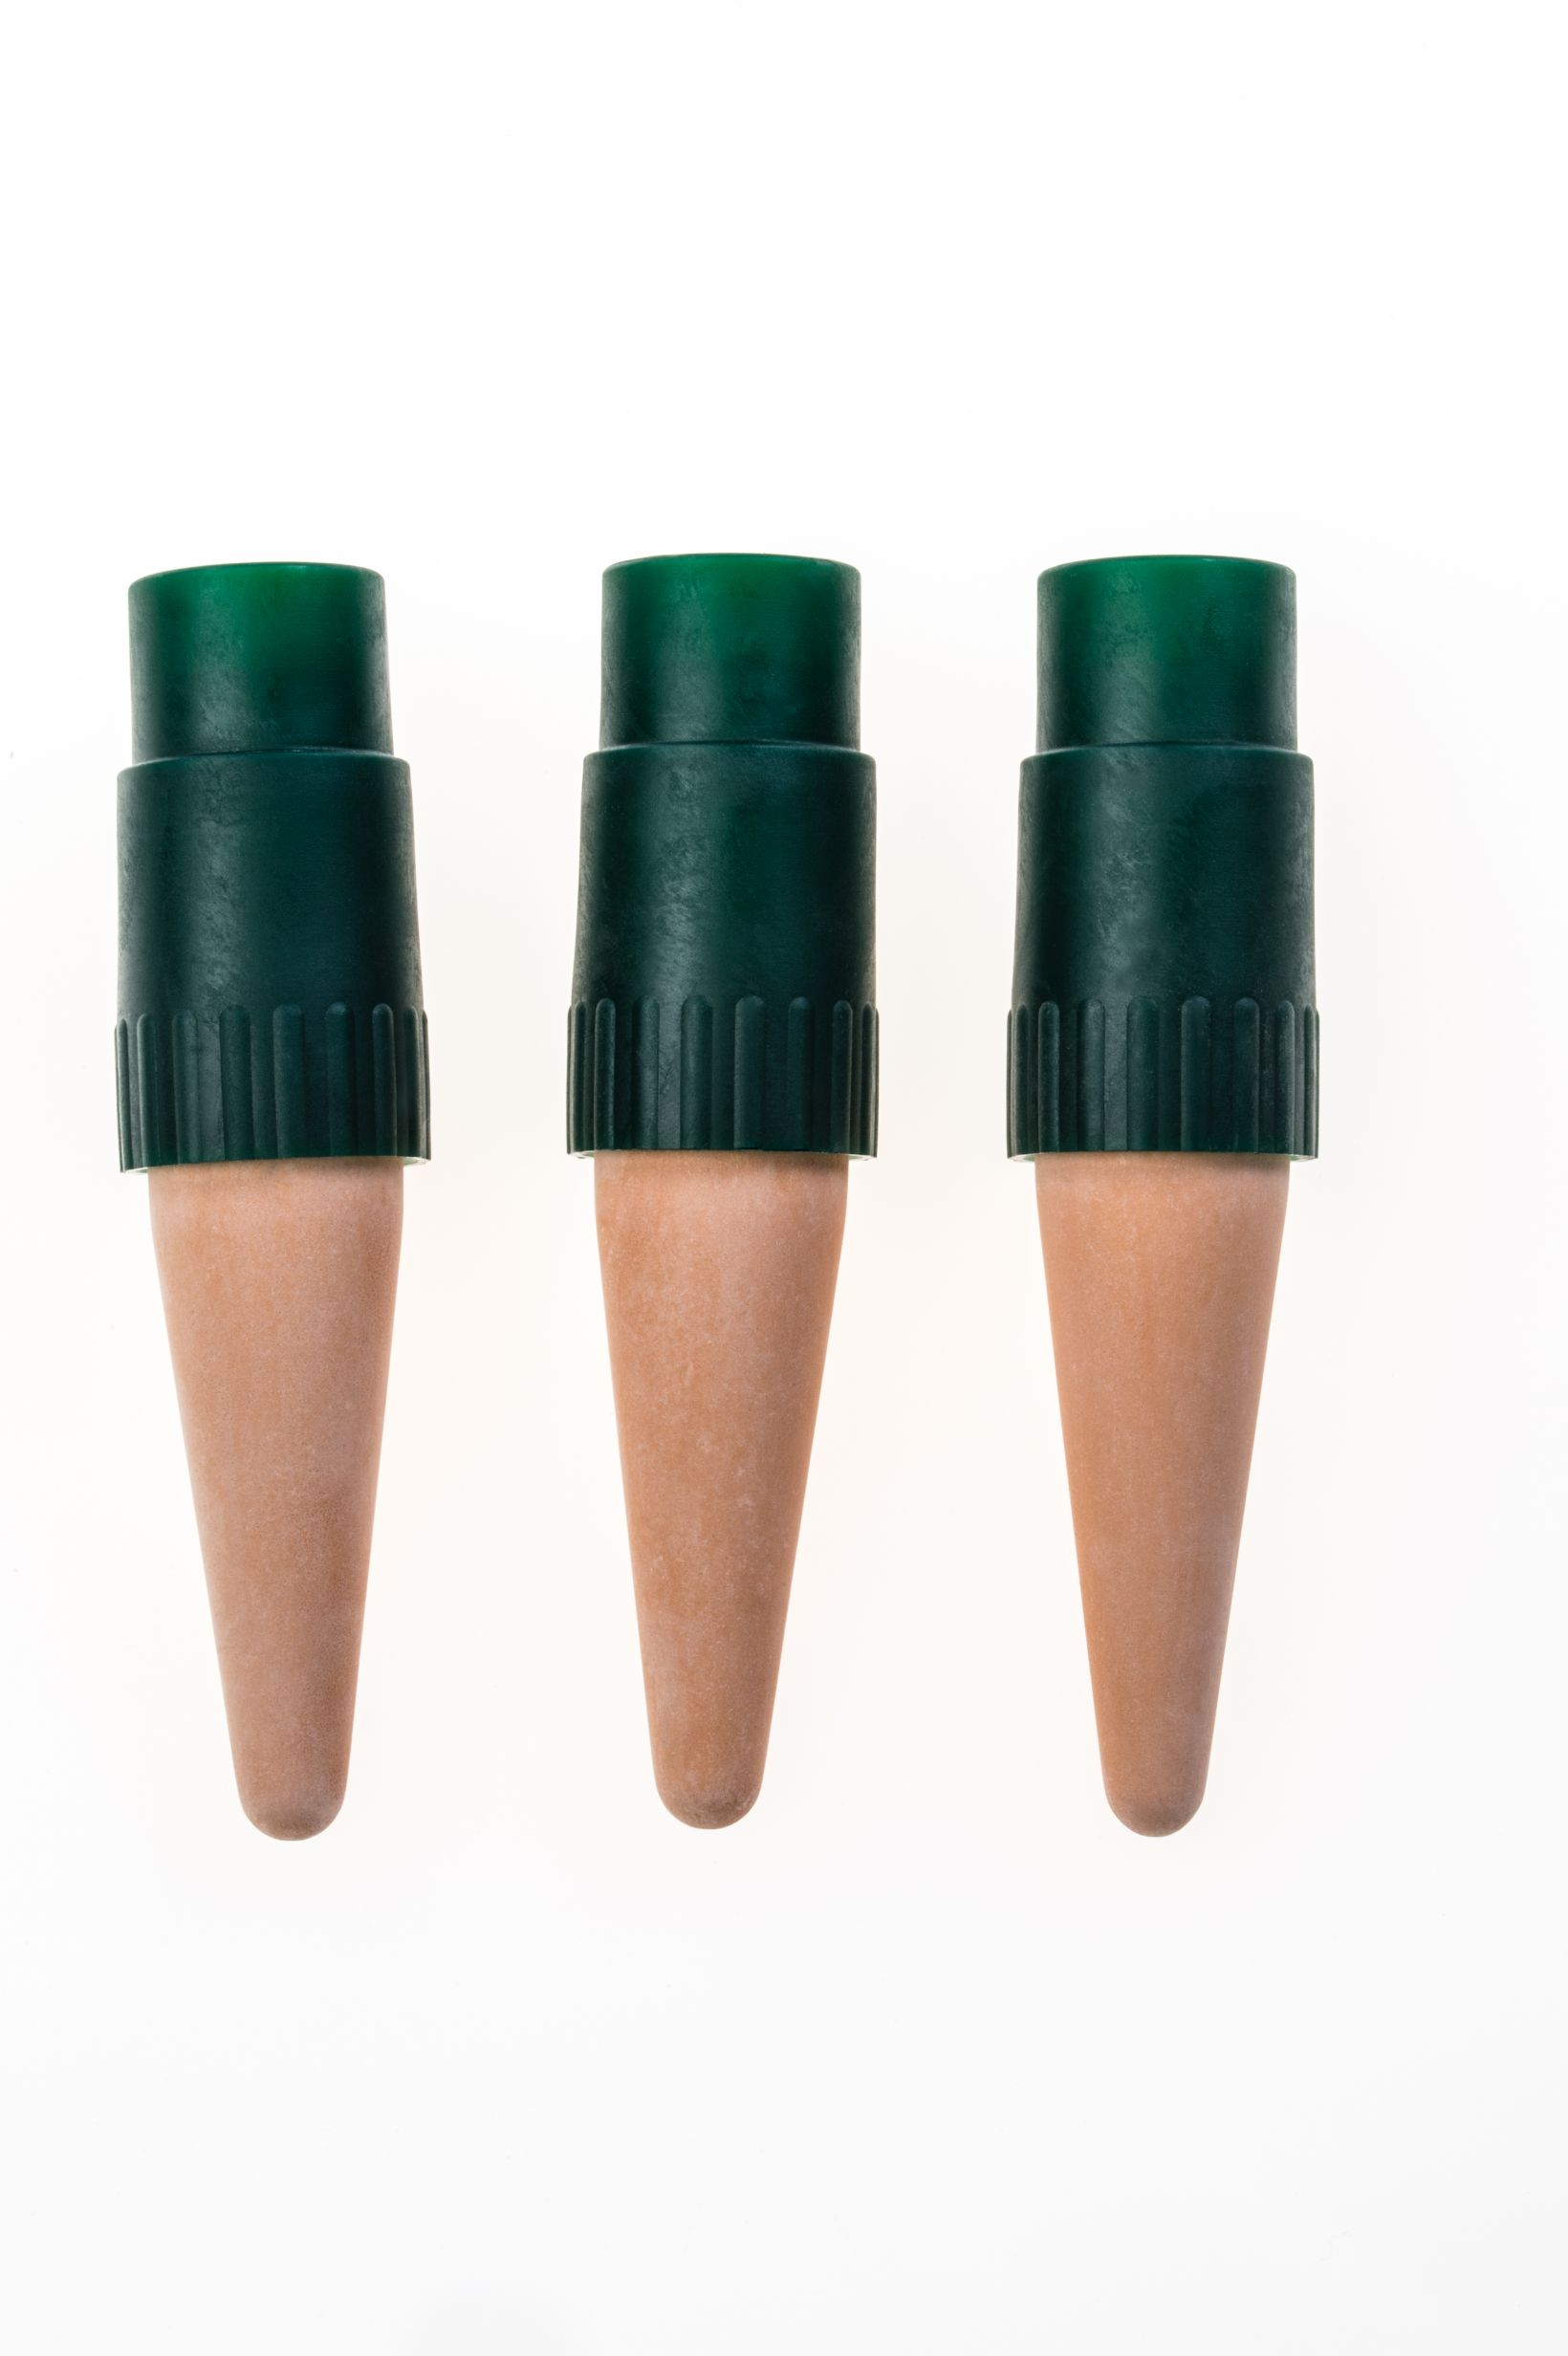 Flessenadapter per 3 stuks 23308 – 3